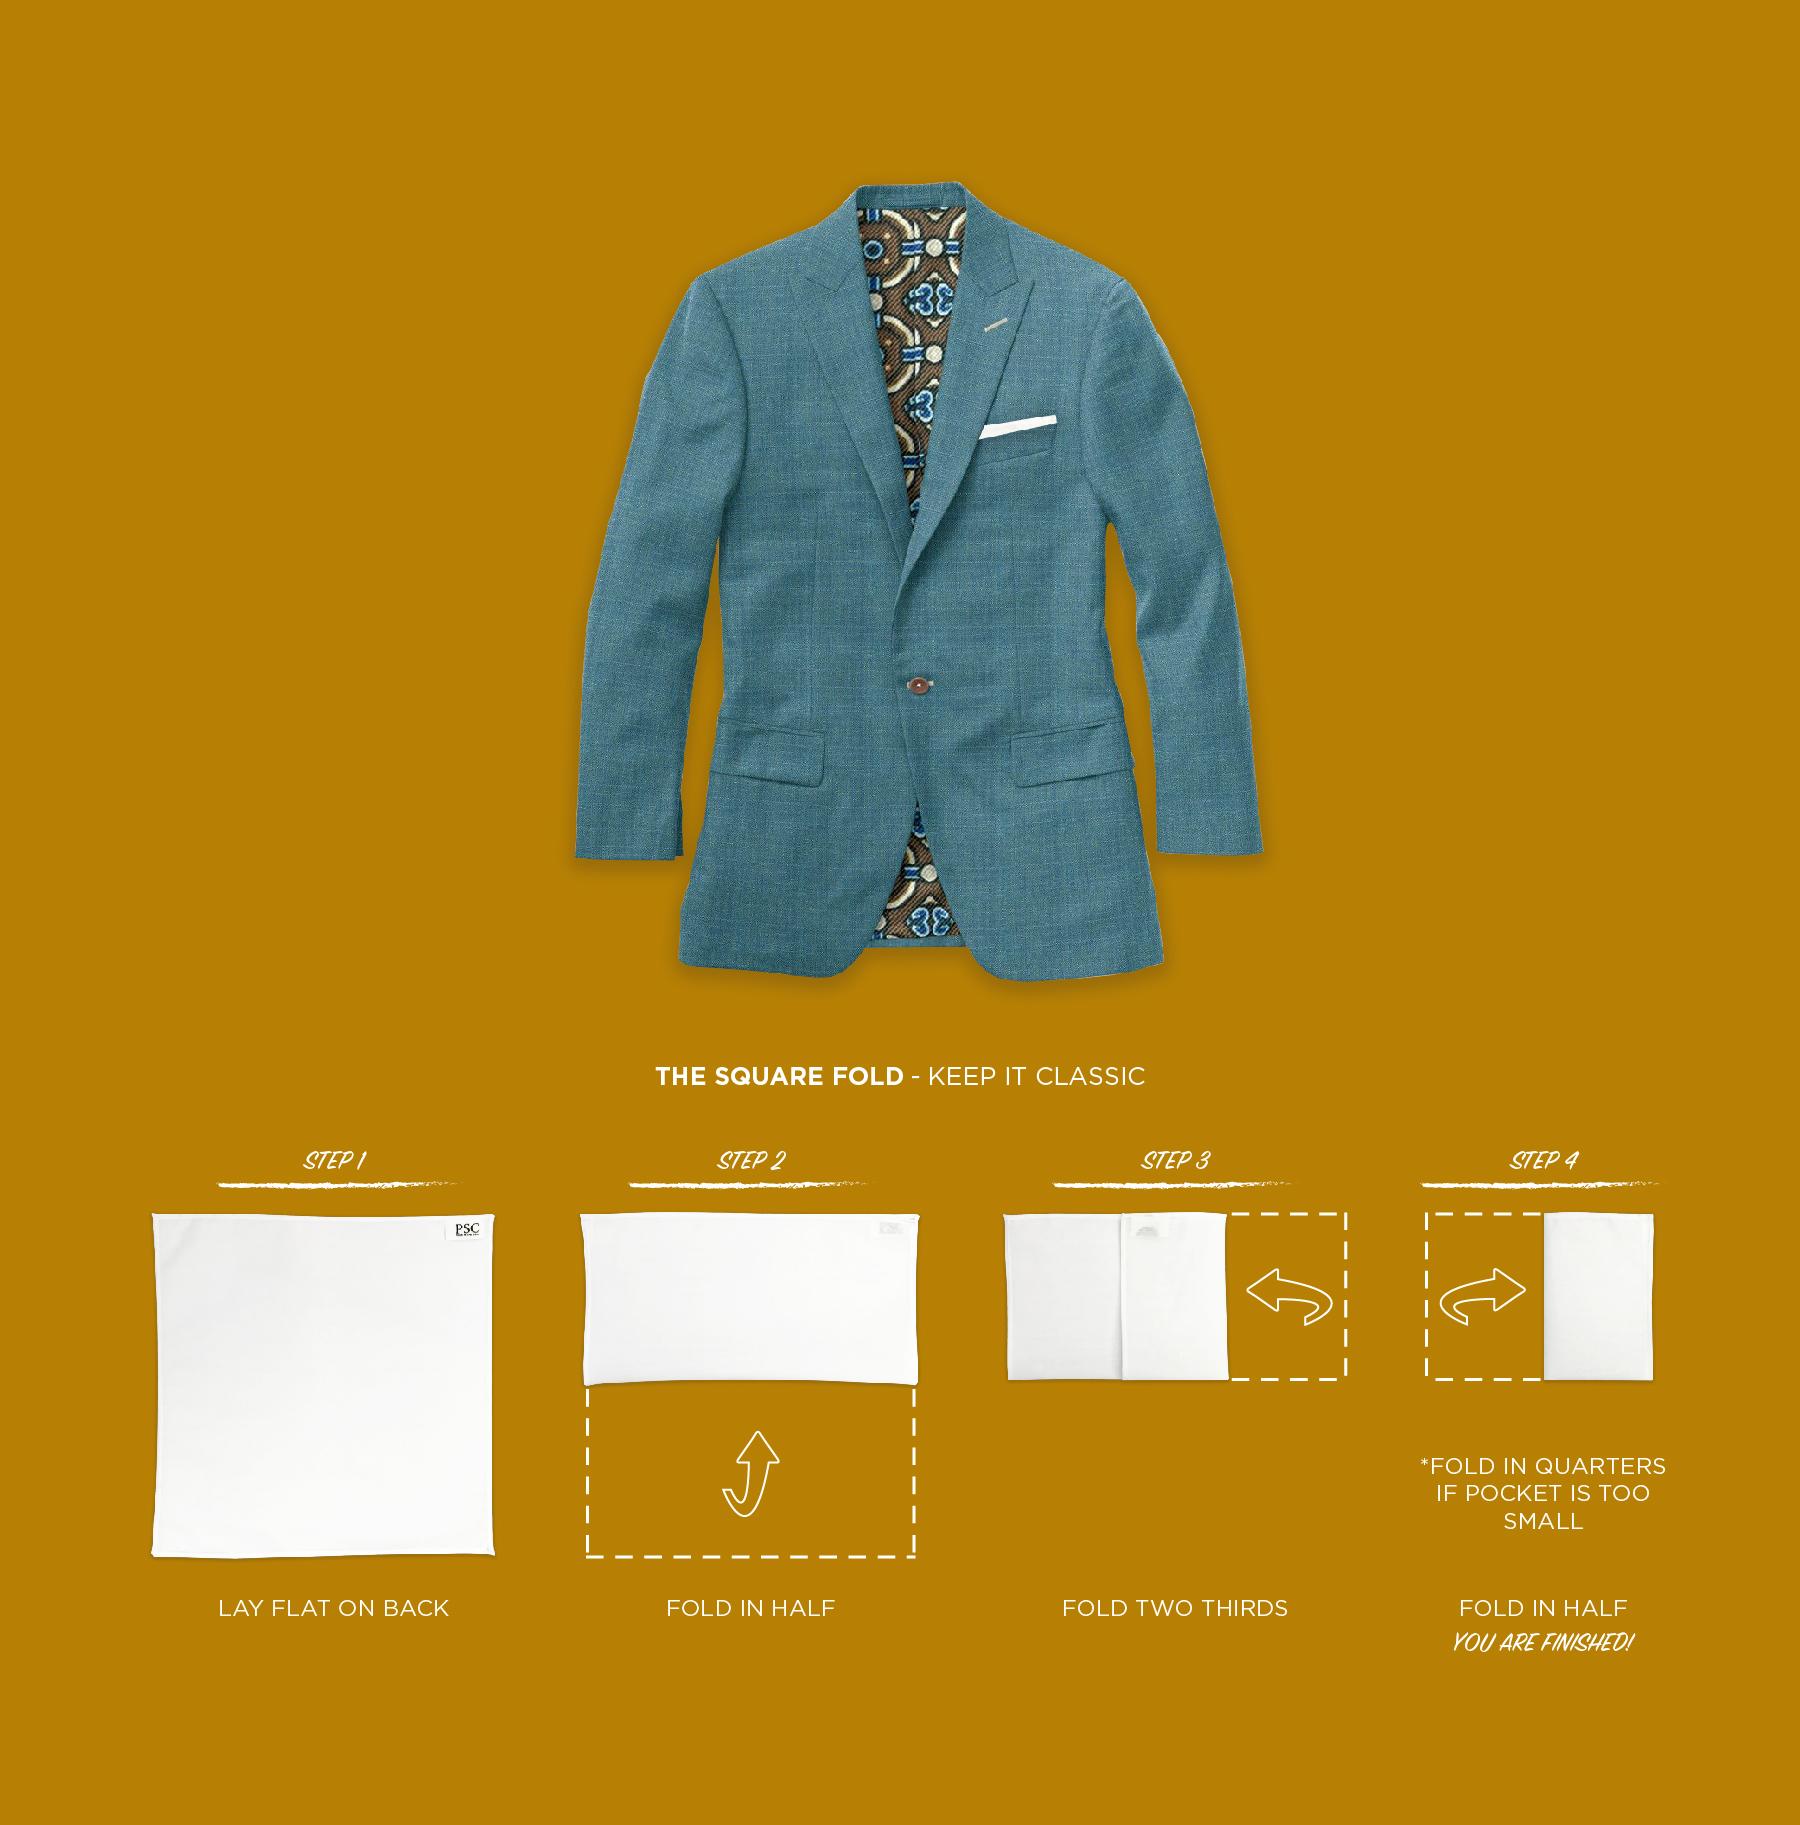 Pocket Square Fold Guide Pocket Square Clothing